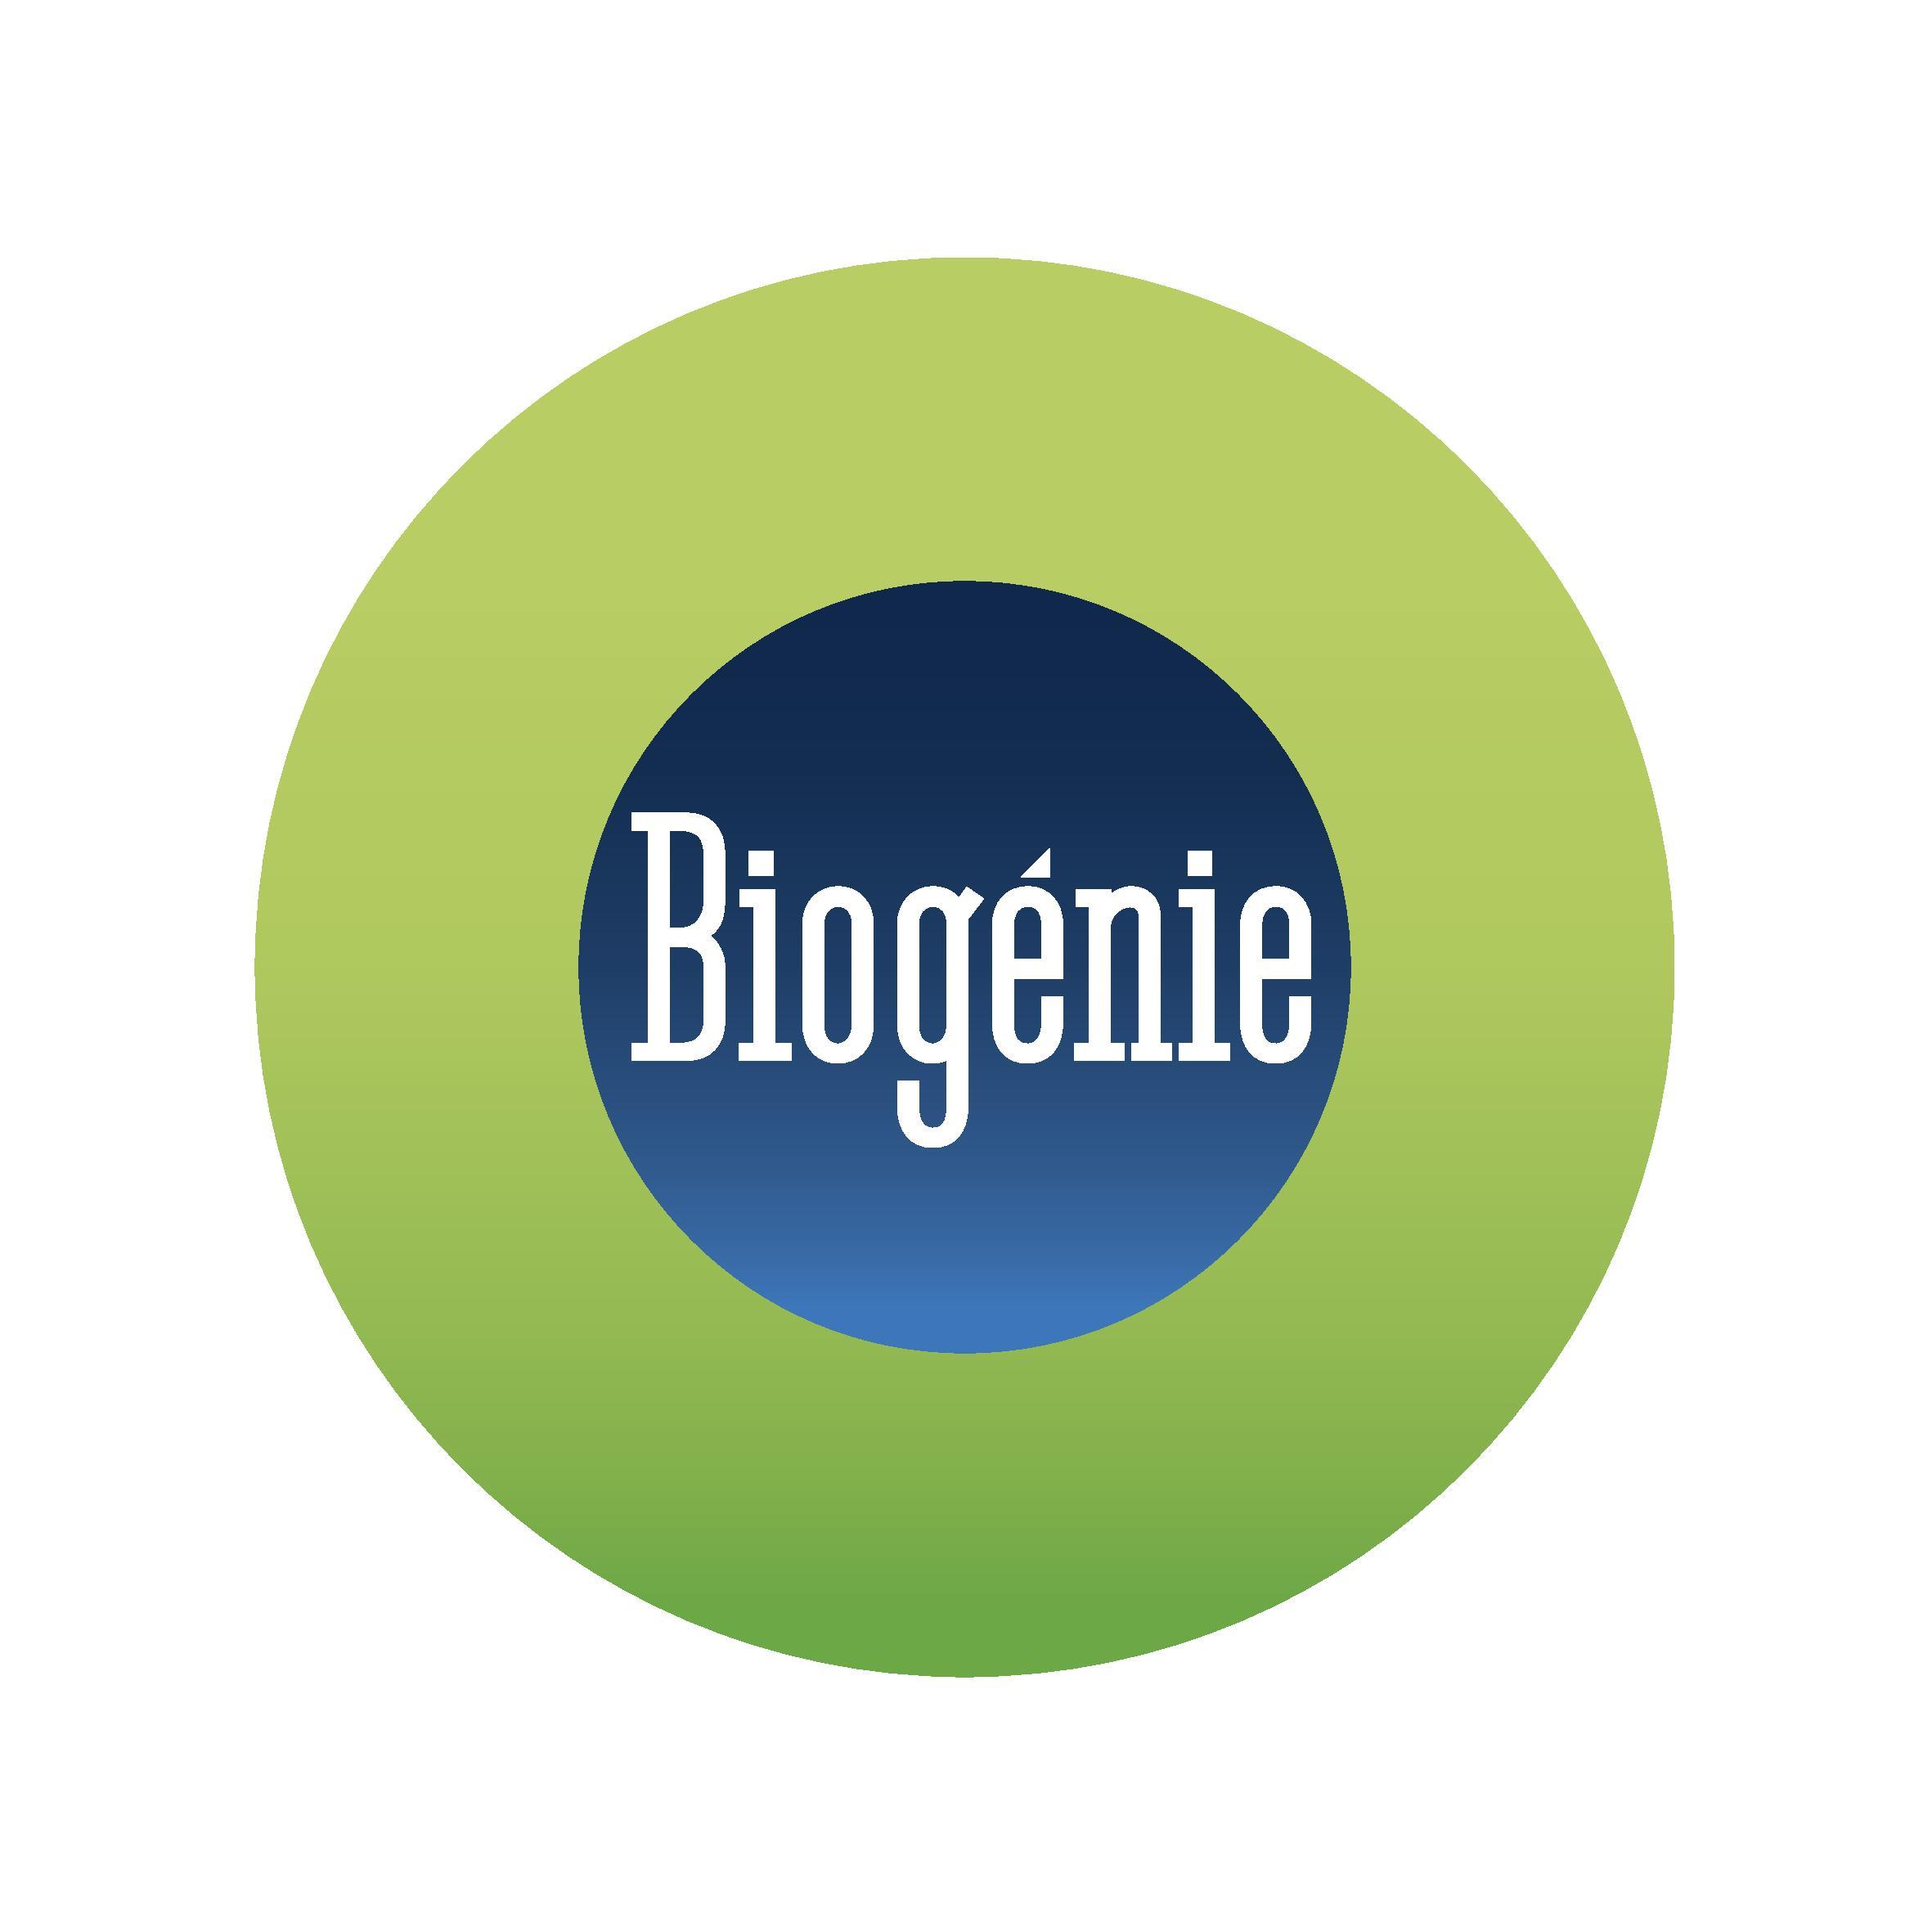 https://0501.nccdn.net/4_2/000/000/06b/a1b/10-biogenie-logo-quadri-print.jpg